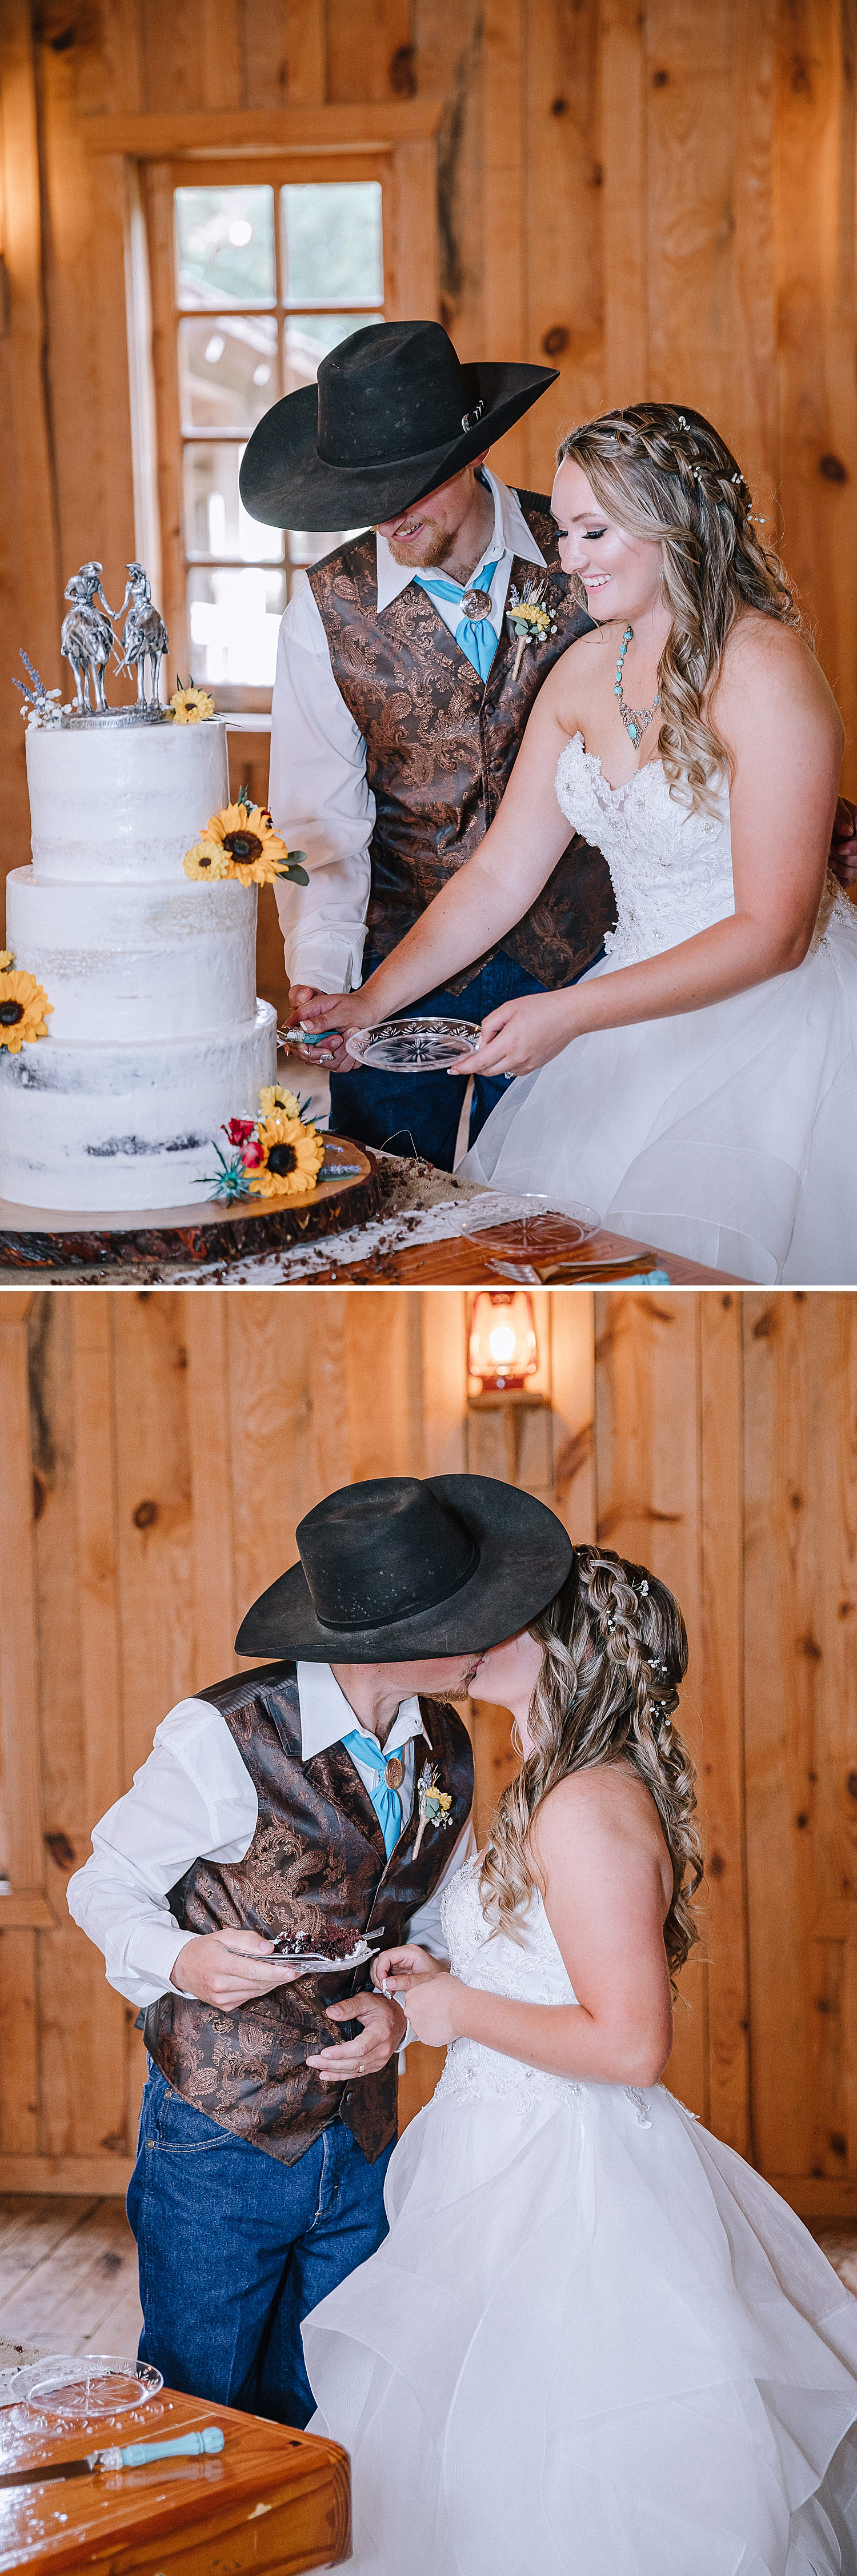 Carly-Barton-Photography-Old-Town-Texas-Rustic-Wedding-Photos-Sunflowers-Boots-Kyle-Texas_0107.jpg